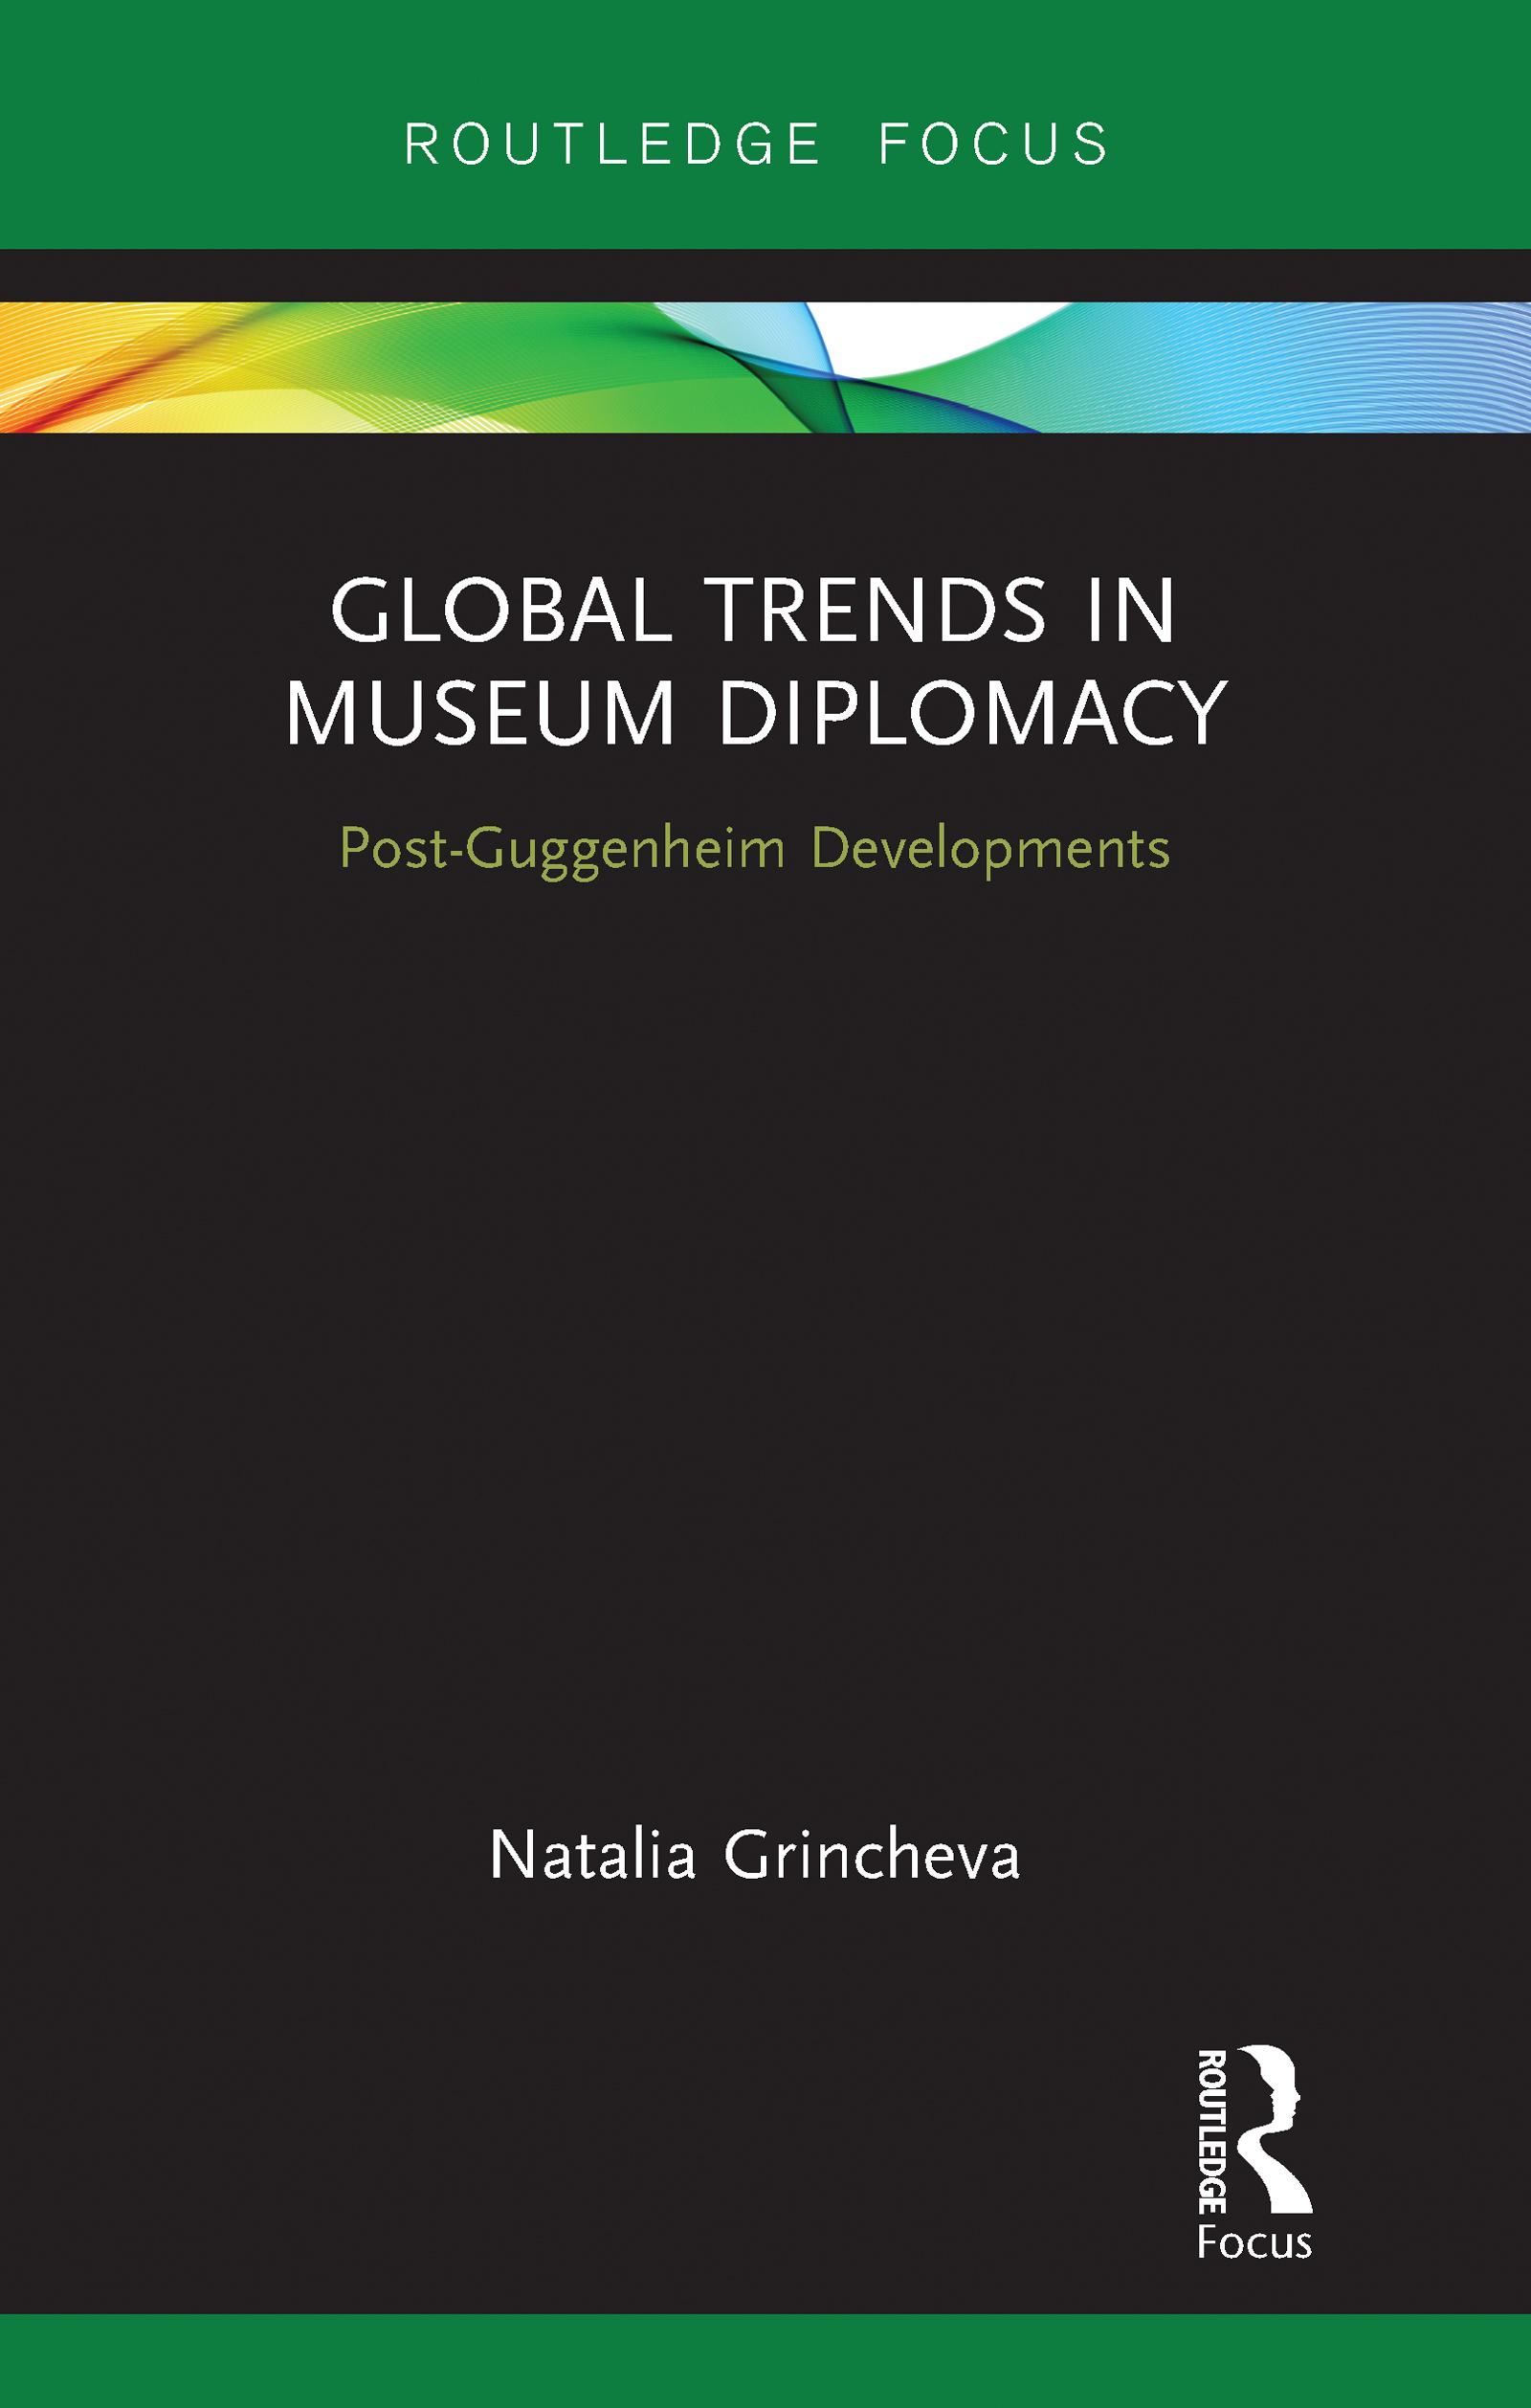 Global Trends in Museum Diplomacy